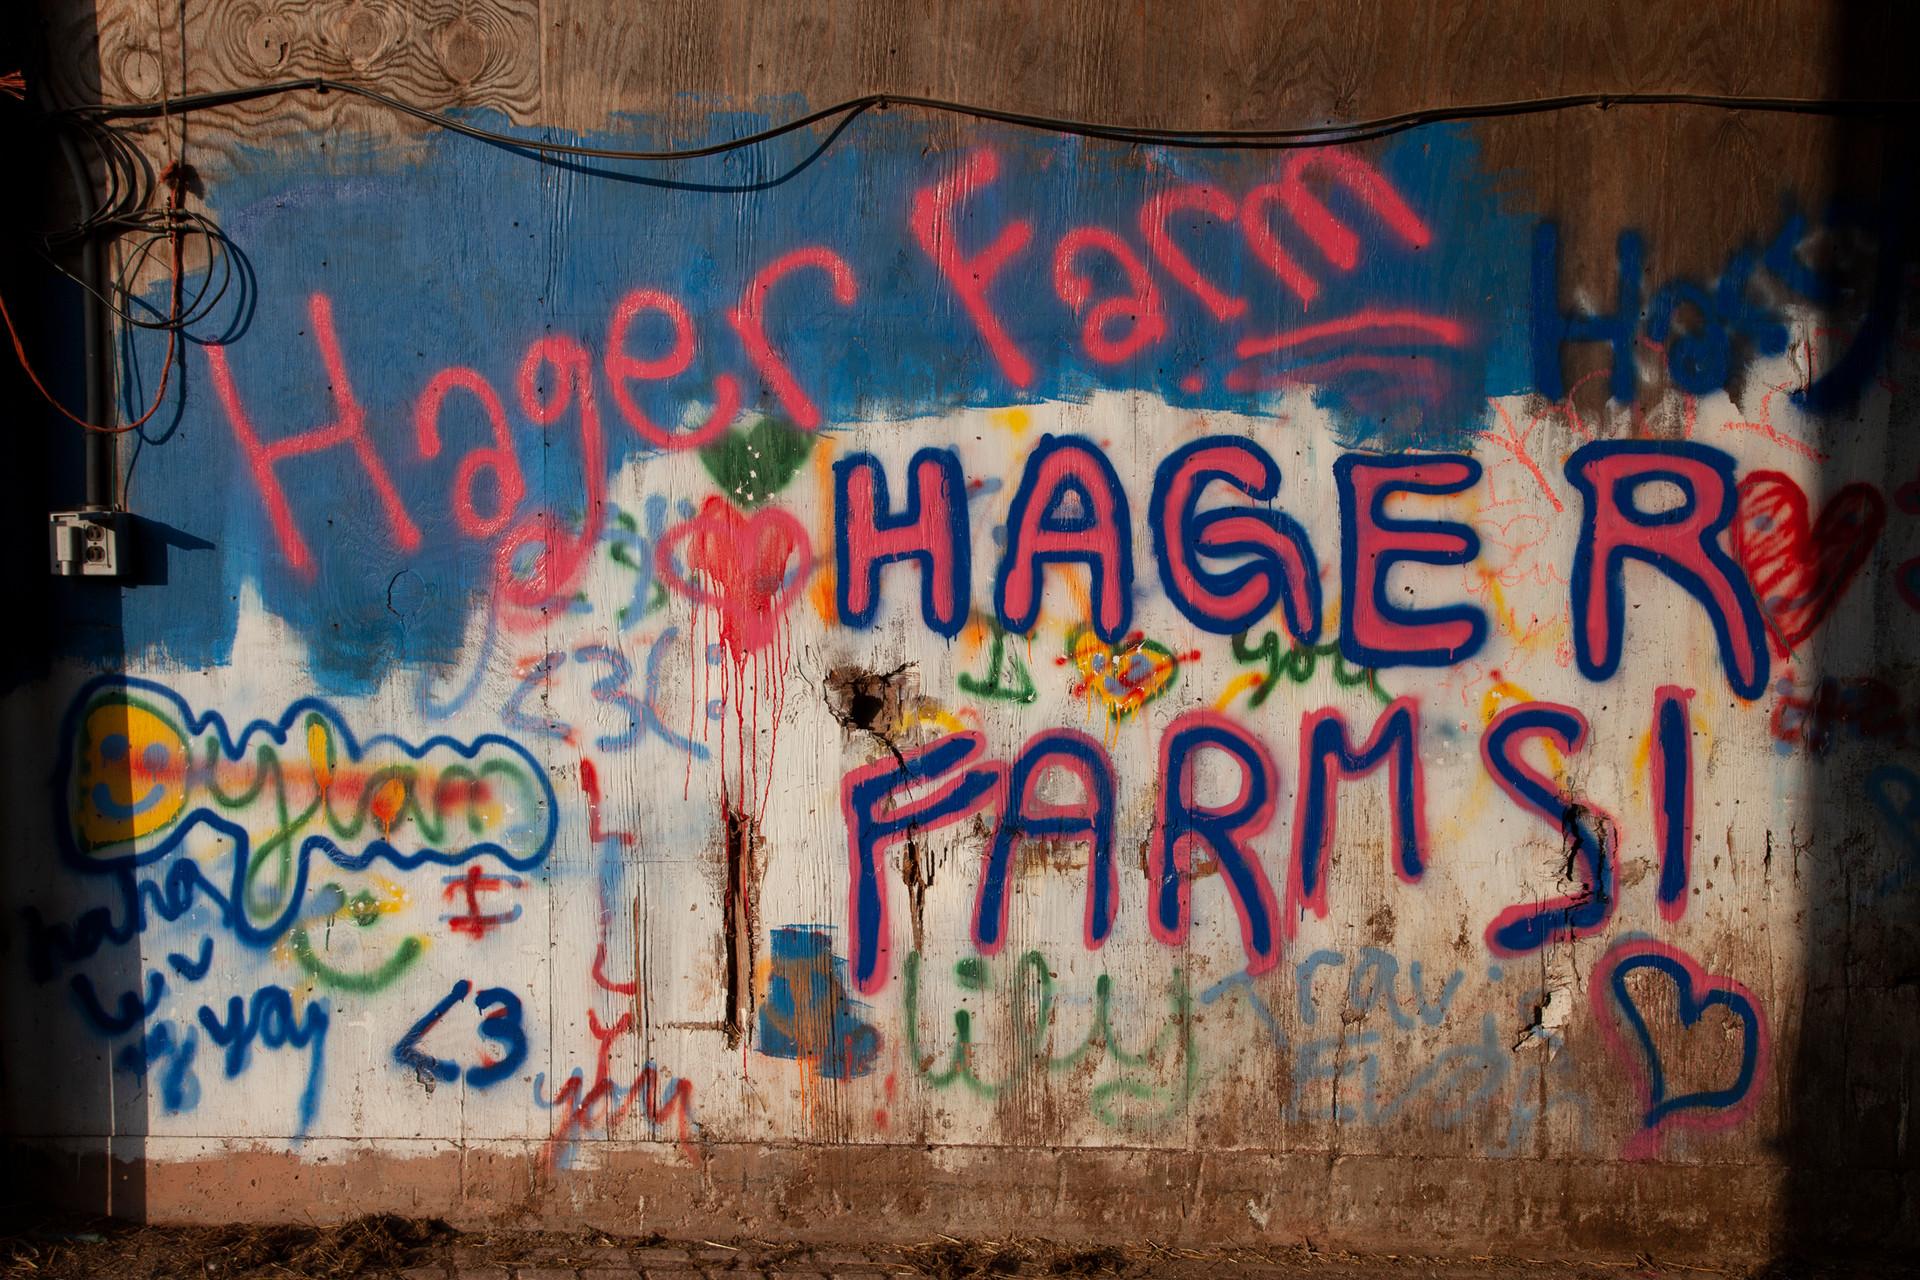 Children's Graffiti at the Hager Dairy Farm. Delaware County, NY, 2016